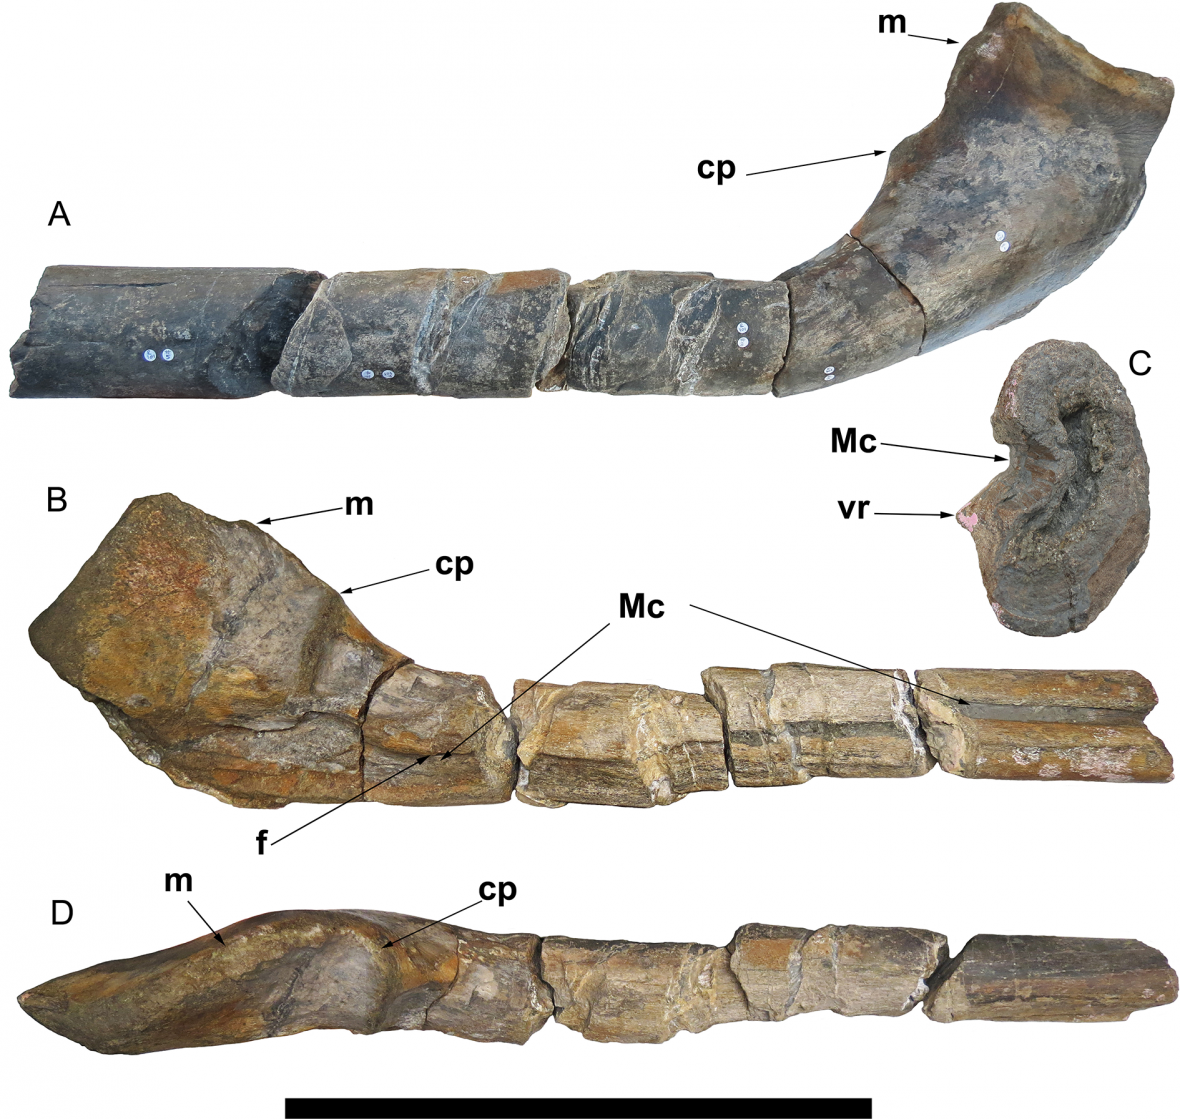 Kosti nově objeveného ichtyosaura